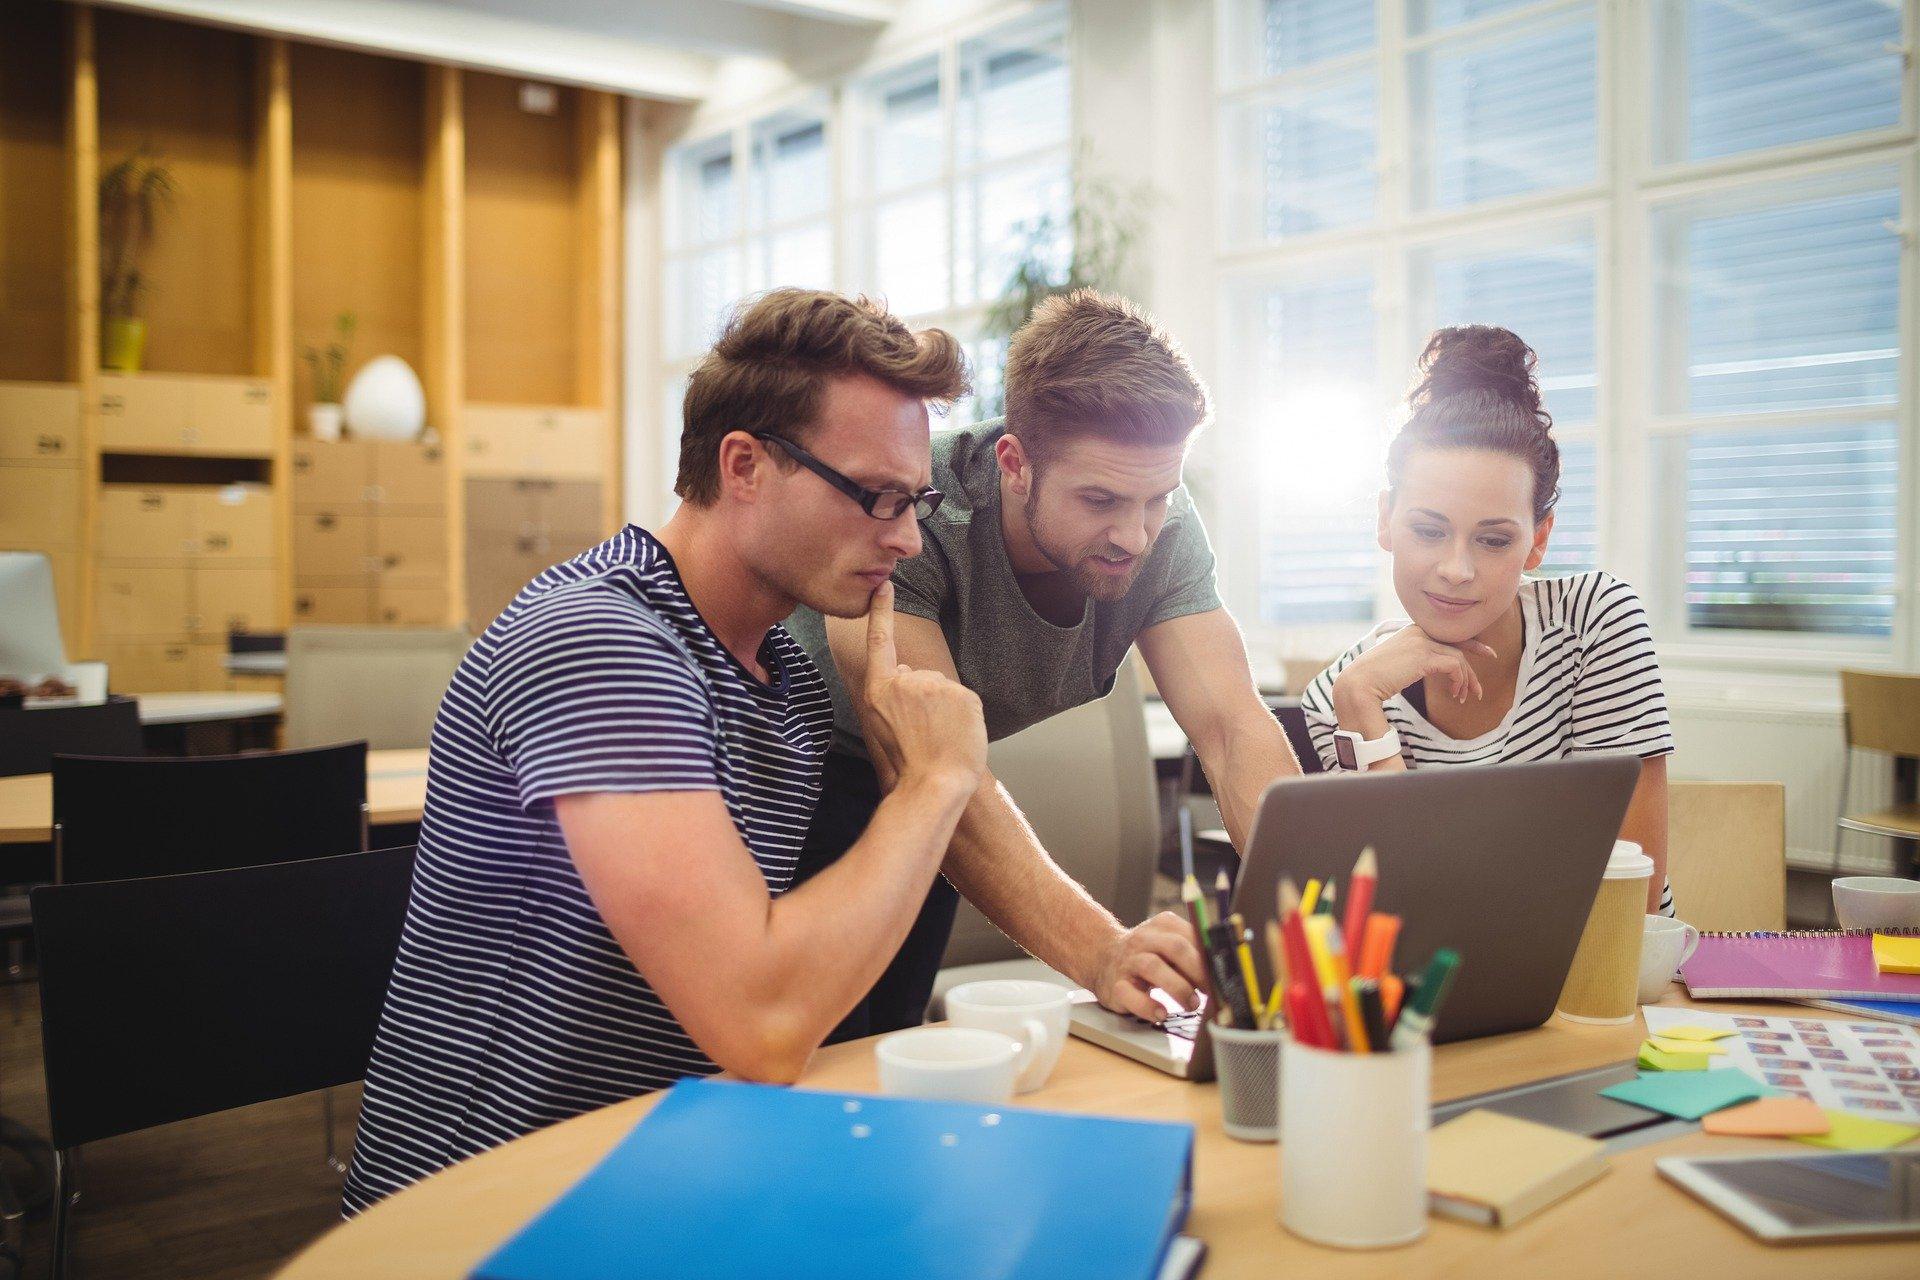 Online Tools Every HR Team Needs